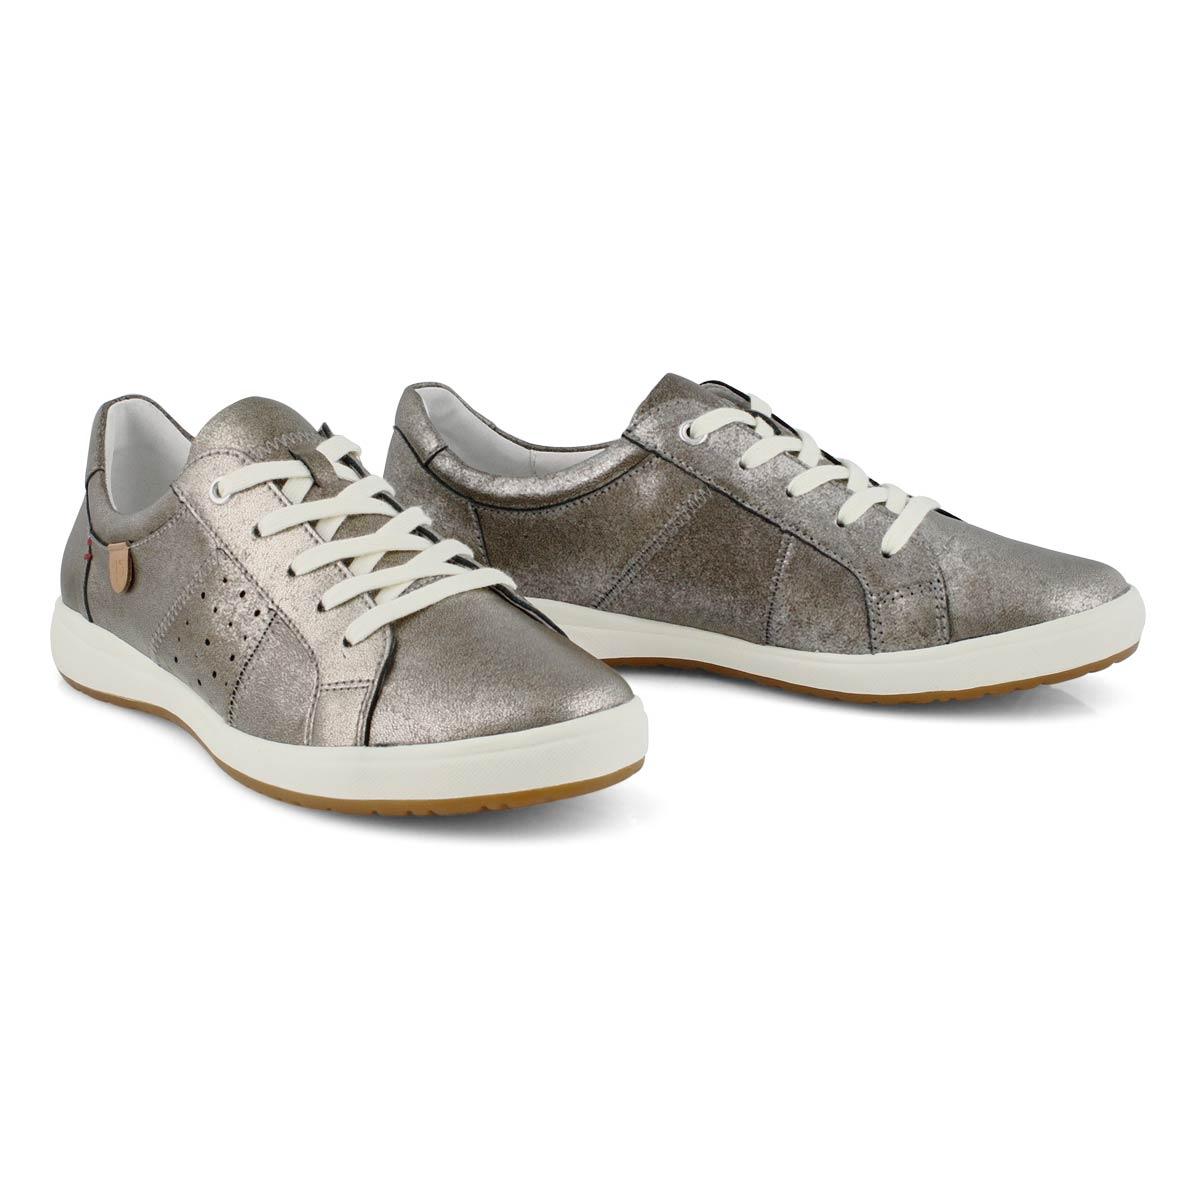 Women's Caren 01 Lace Up Sneaker - Platinum